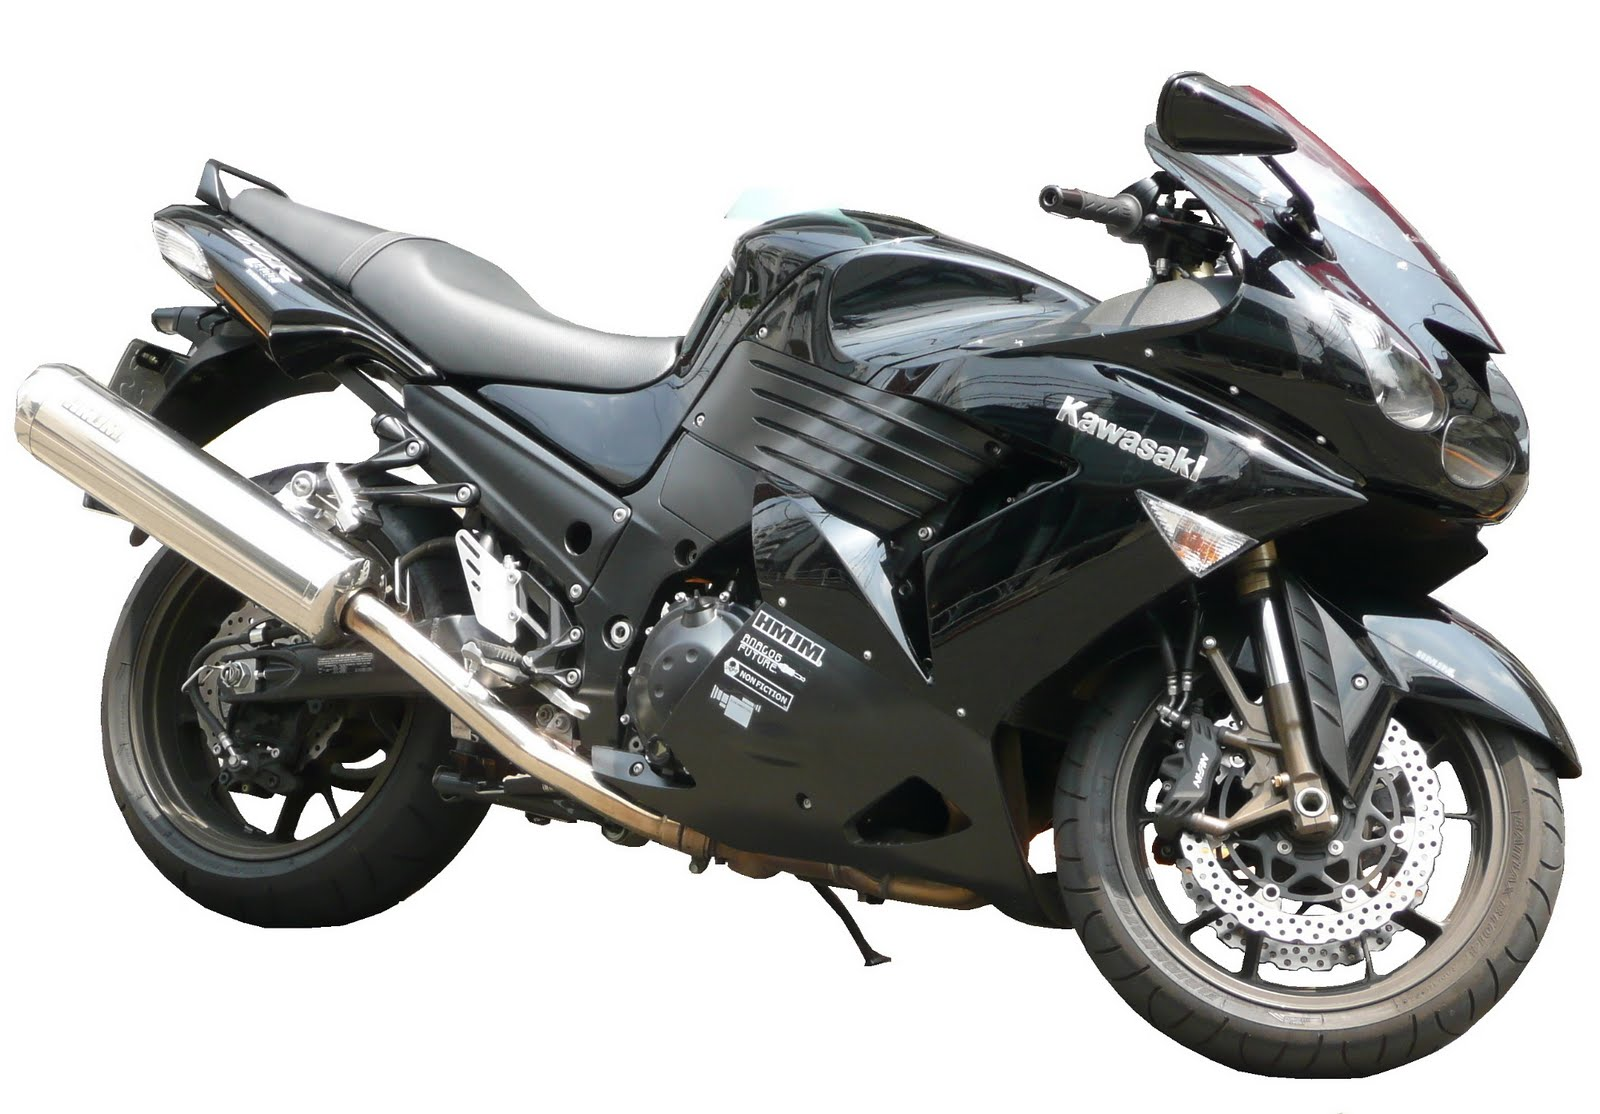 motorcycles: Kawasaki ZZR1400 / ZX14 key features